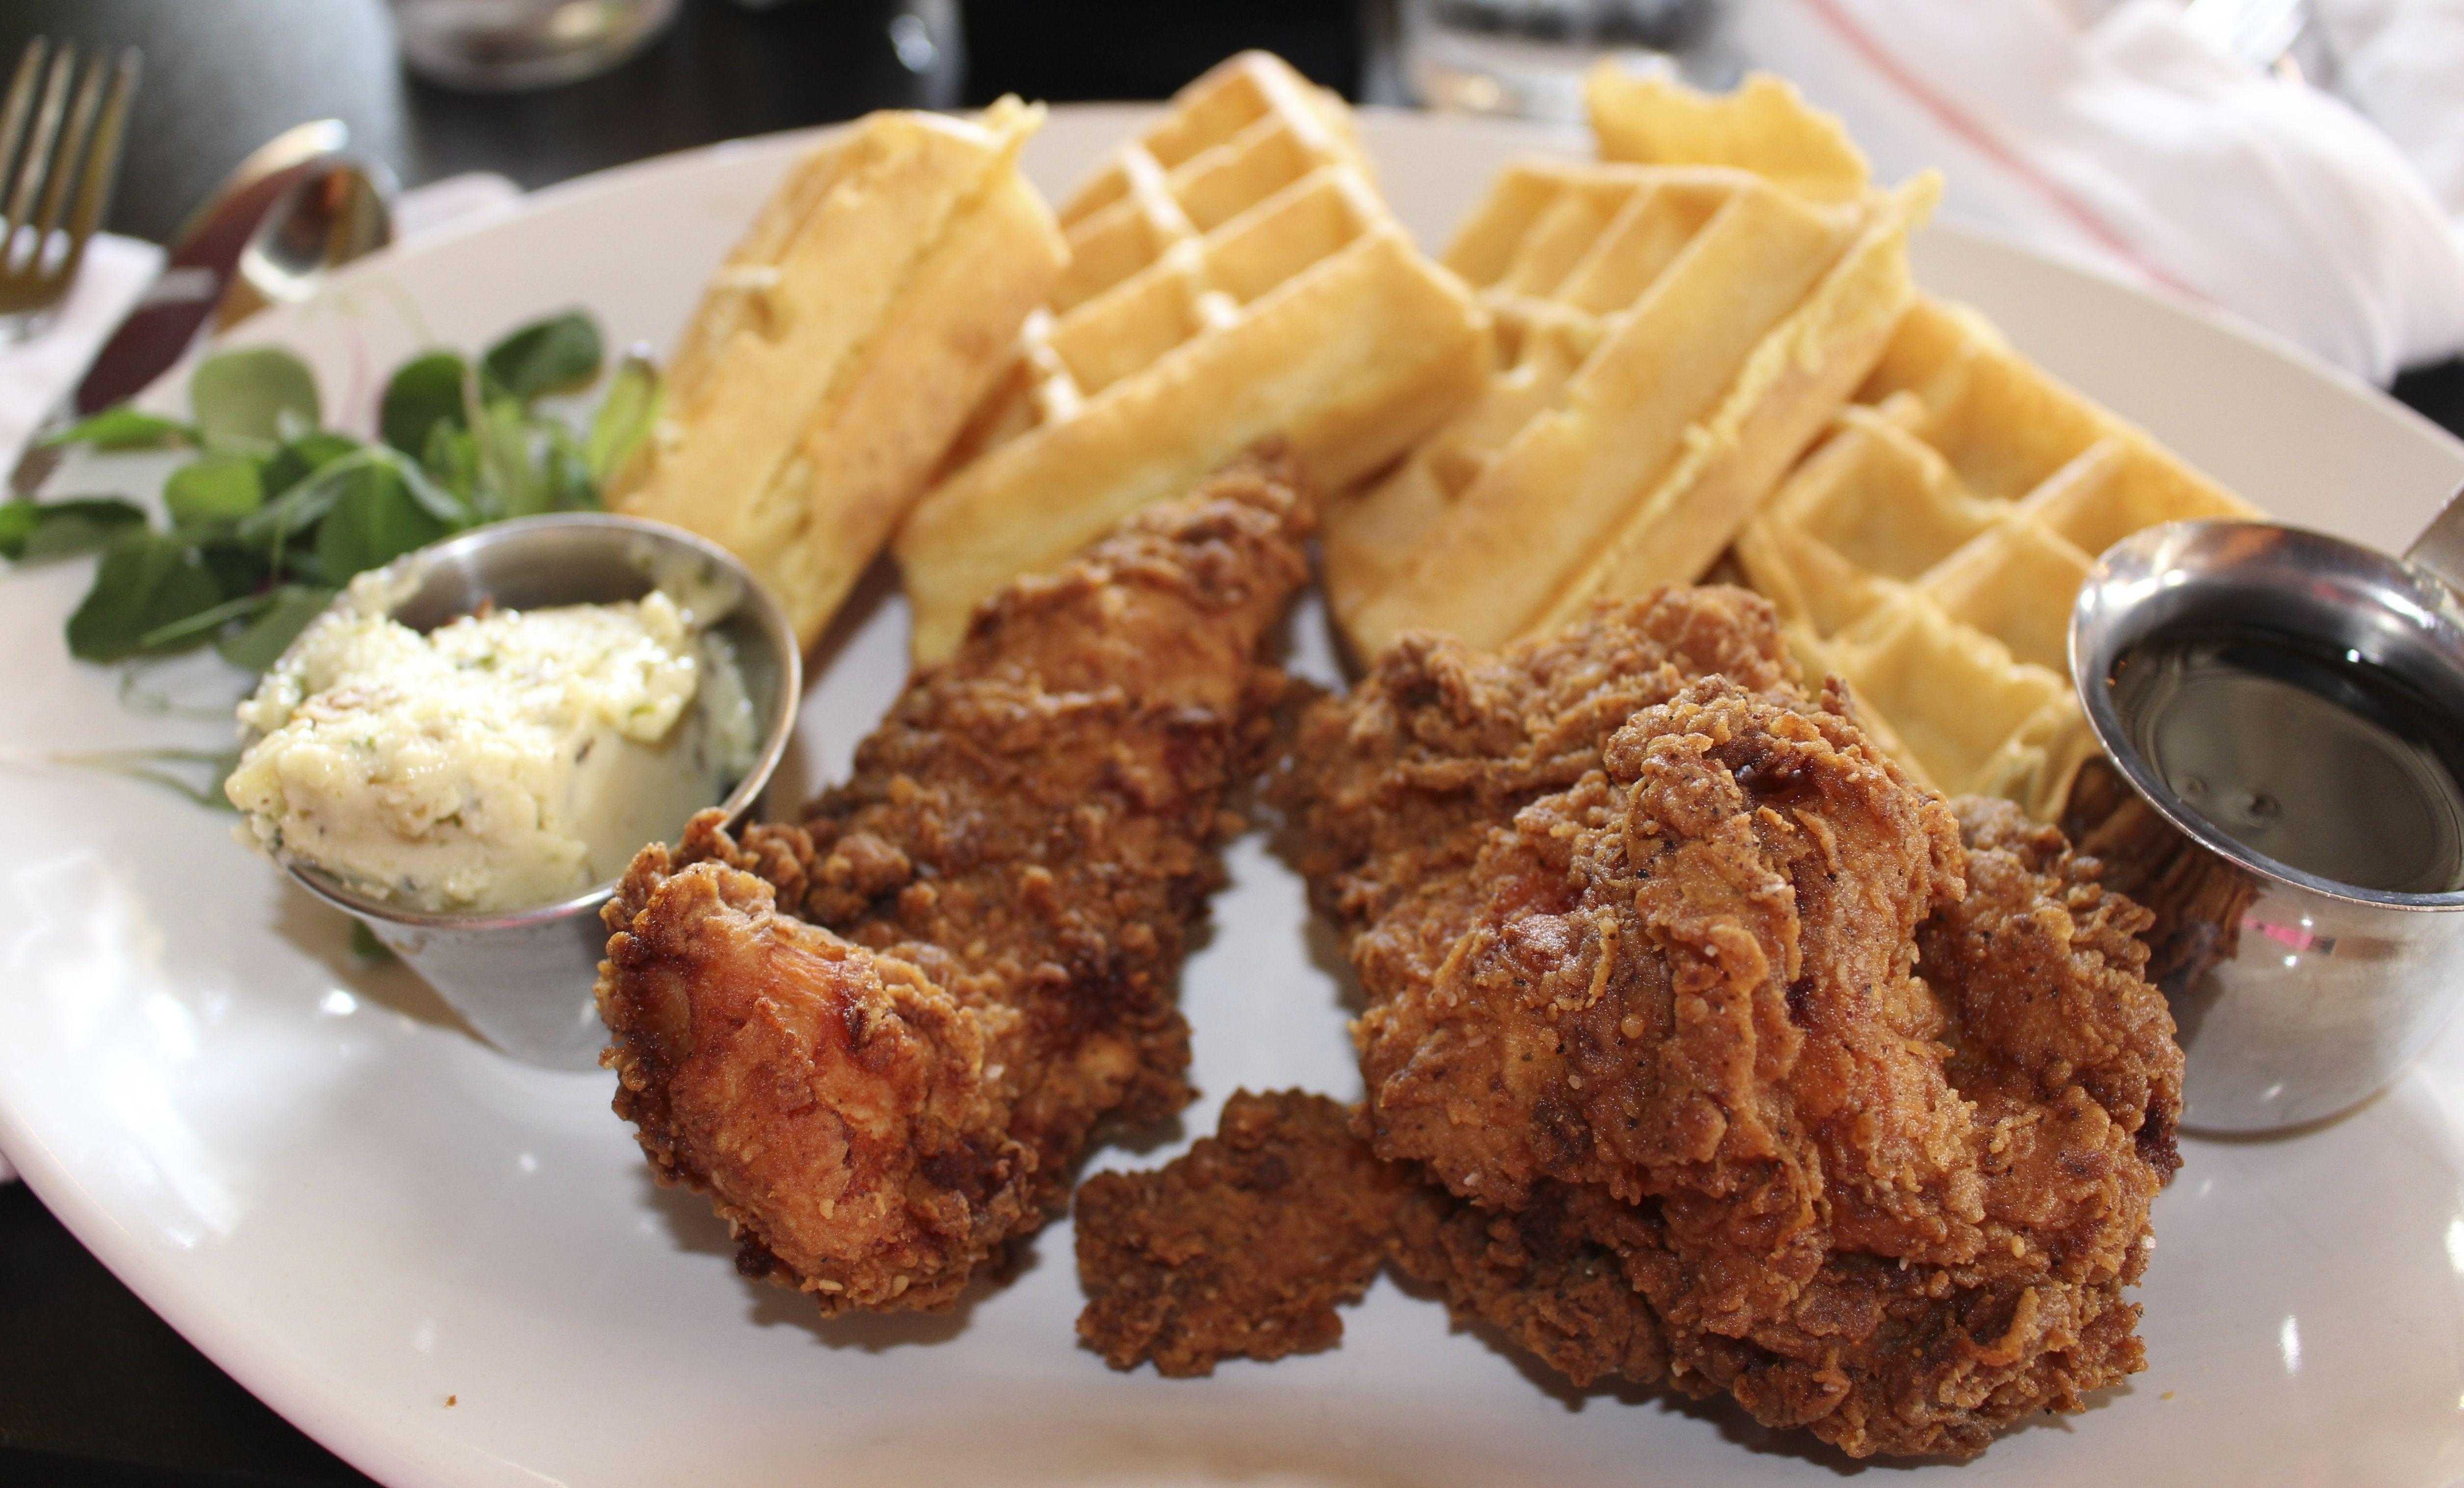 Best En And Waffles In Kansas City Are From The Corner Restaurant Westport